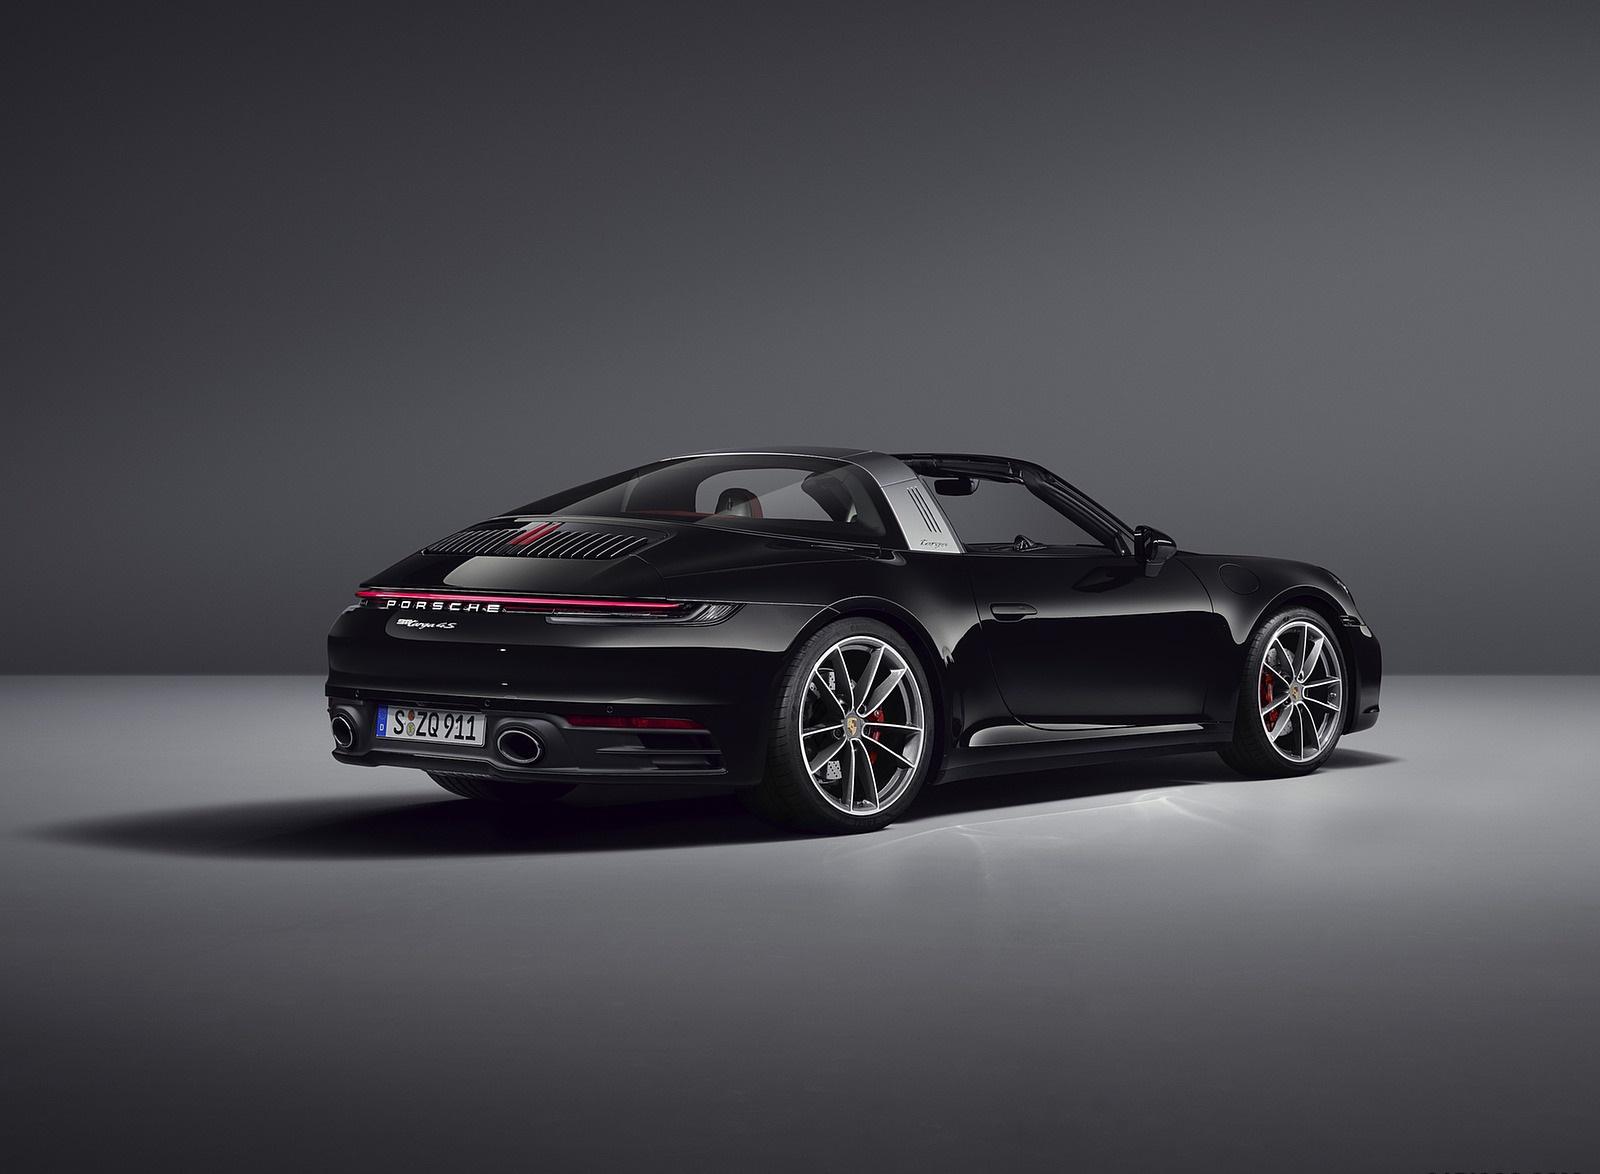 2021 Porsche 911 Targa 4S Rear Three-Quarter Wallpapers (10)